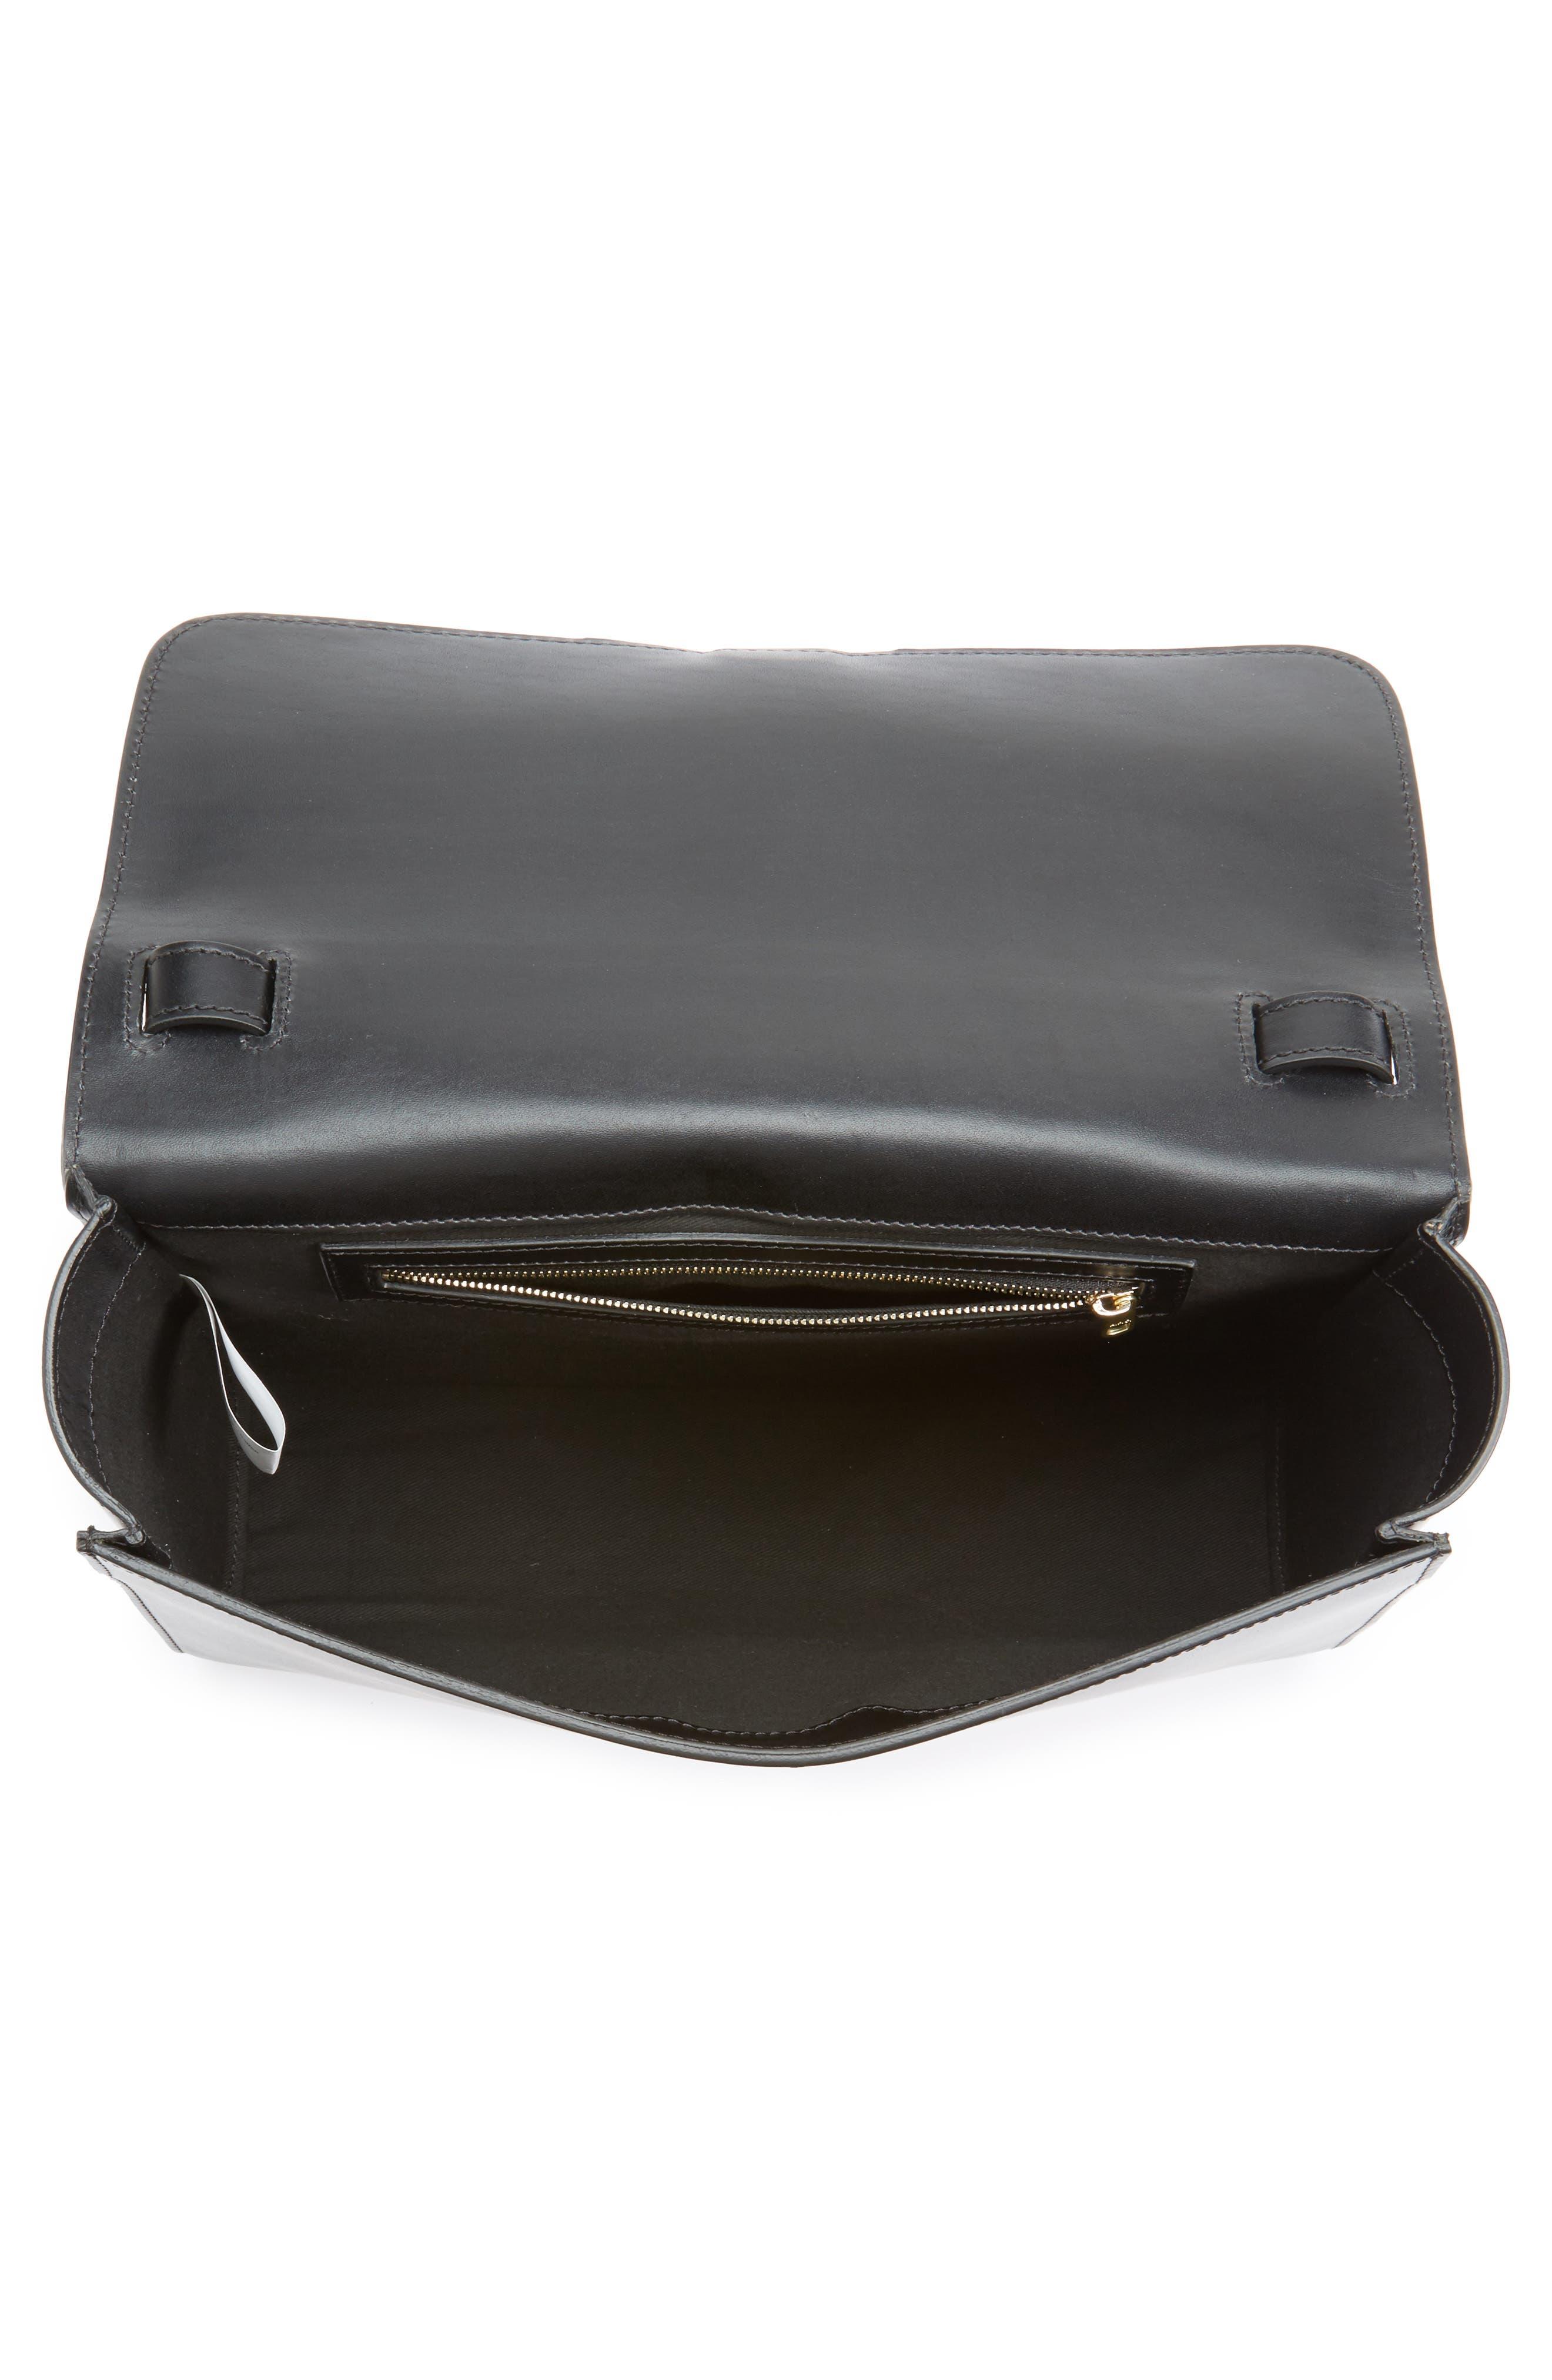 Alternate Image 3  - A.P.C. Katy Calfskin Leather Messenger Bag